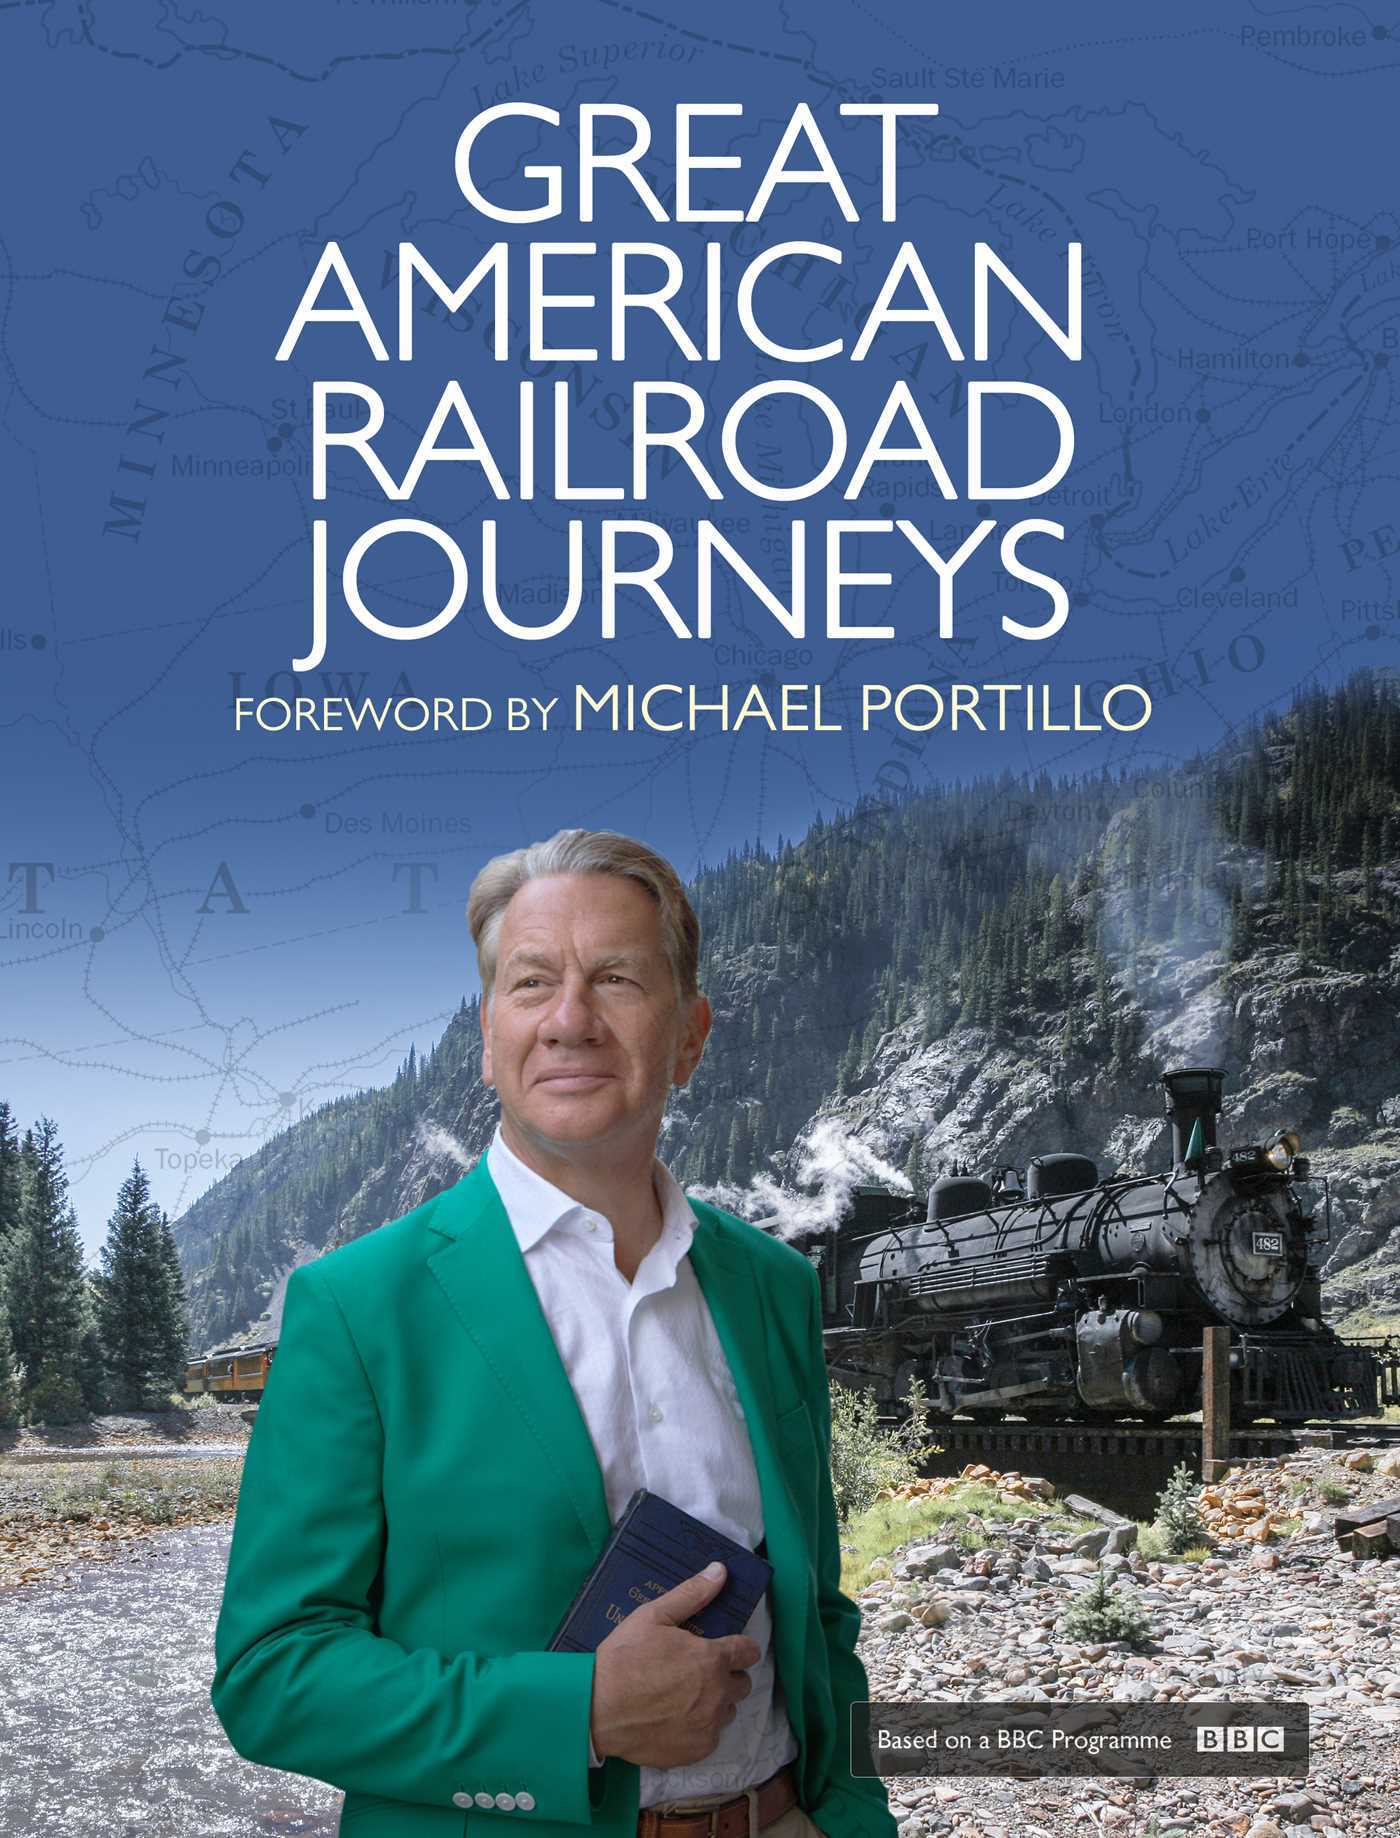 Great american railroad journeys 9781471151514 hr